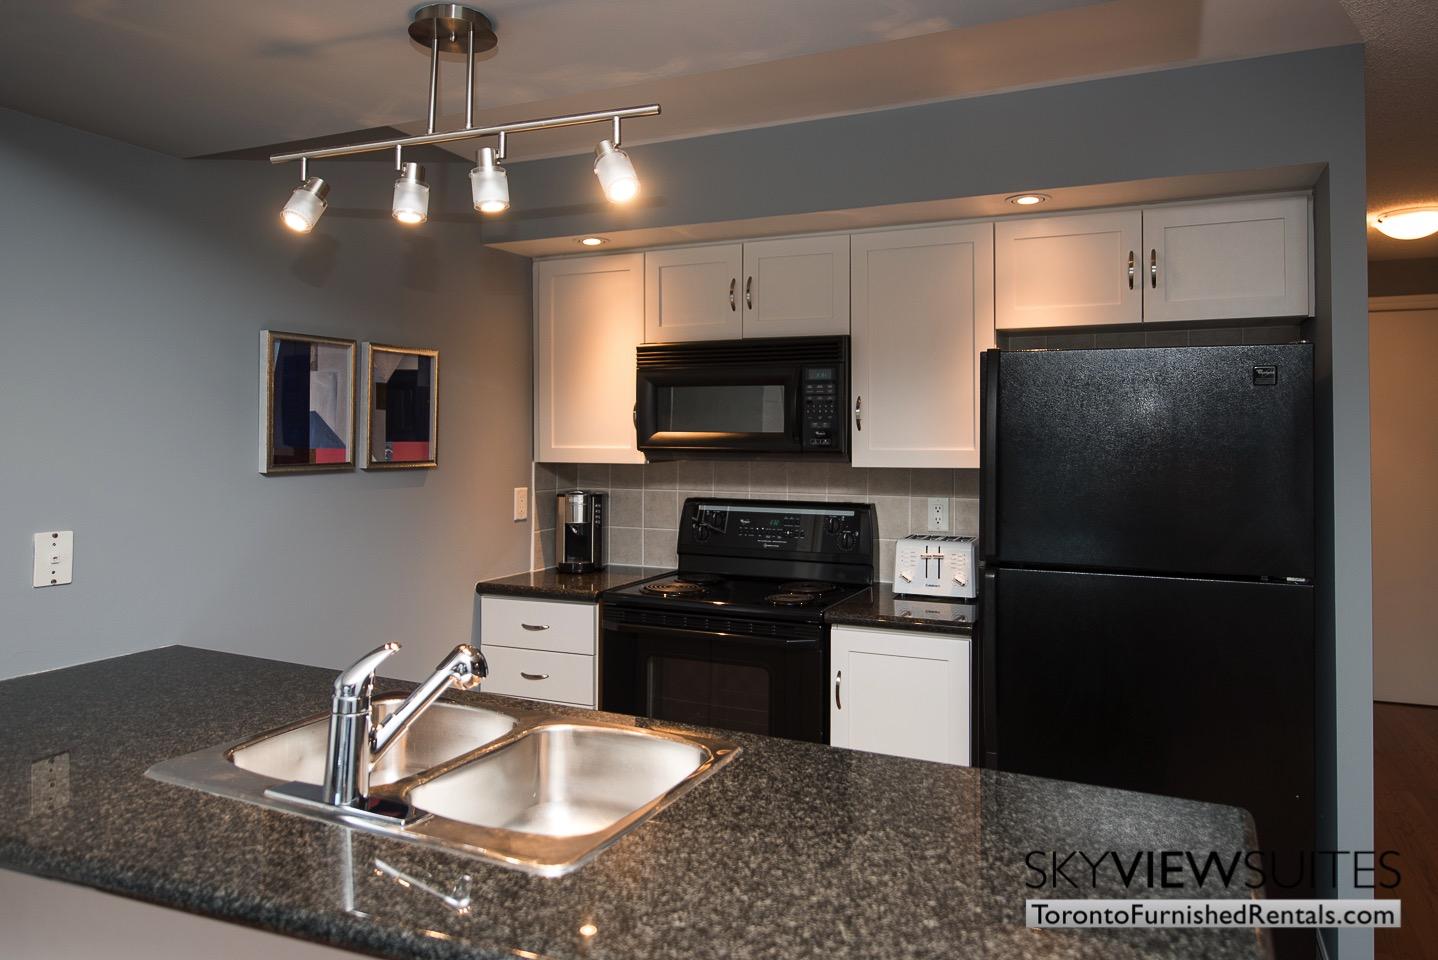 Wellington and Blue Jays Way executive rentals toronto kitchen applicances